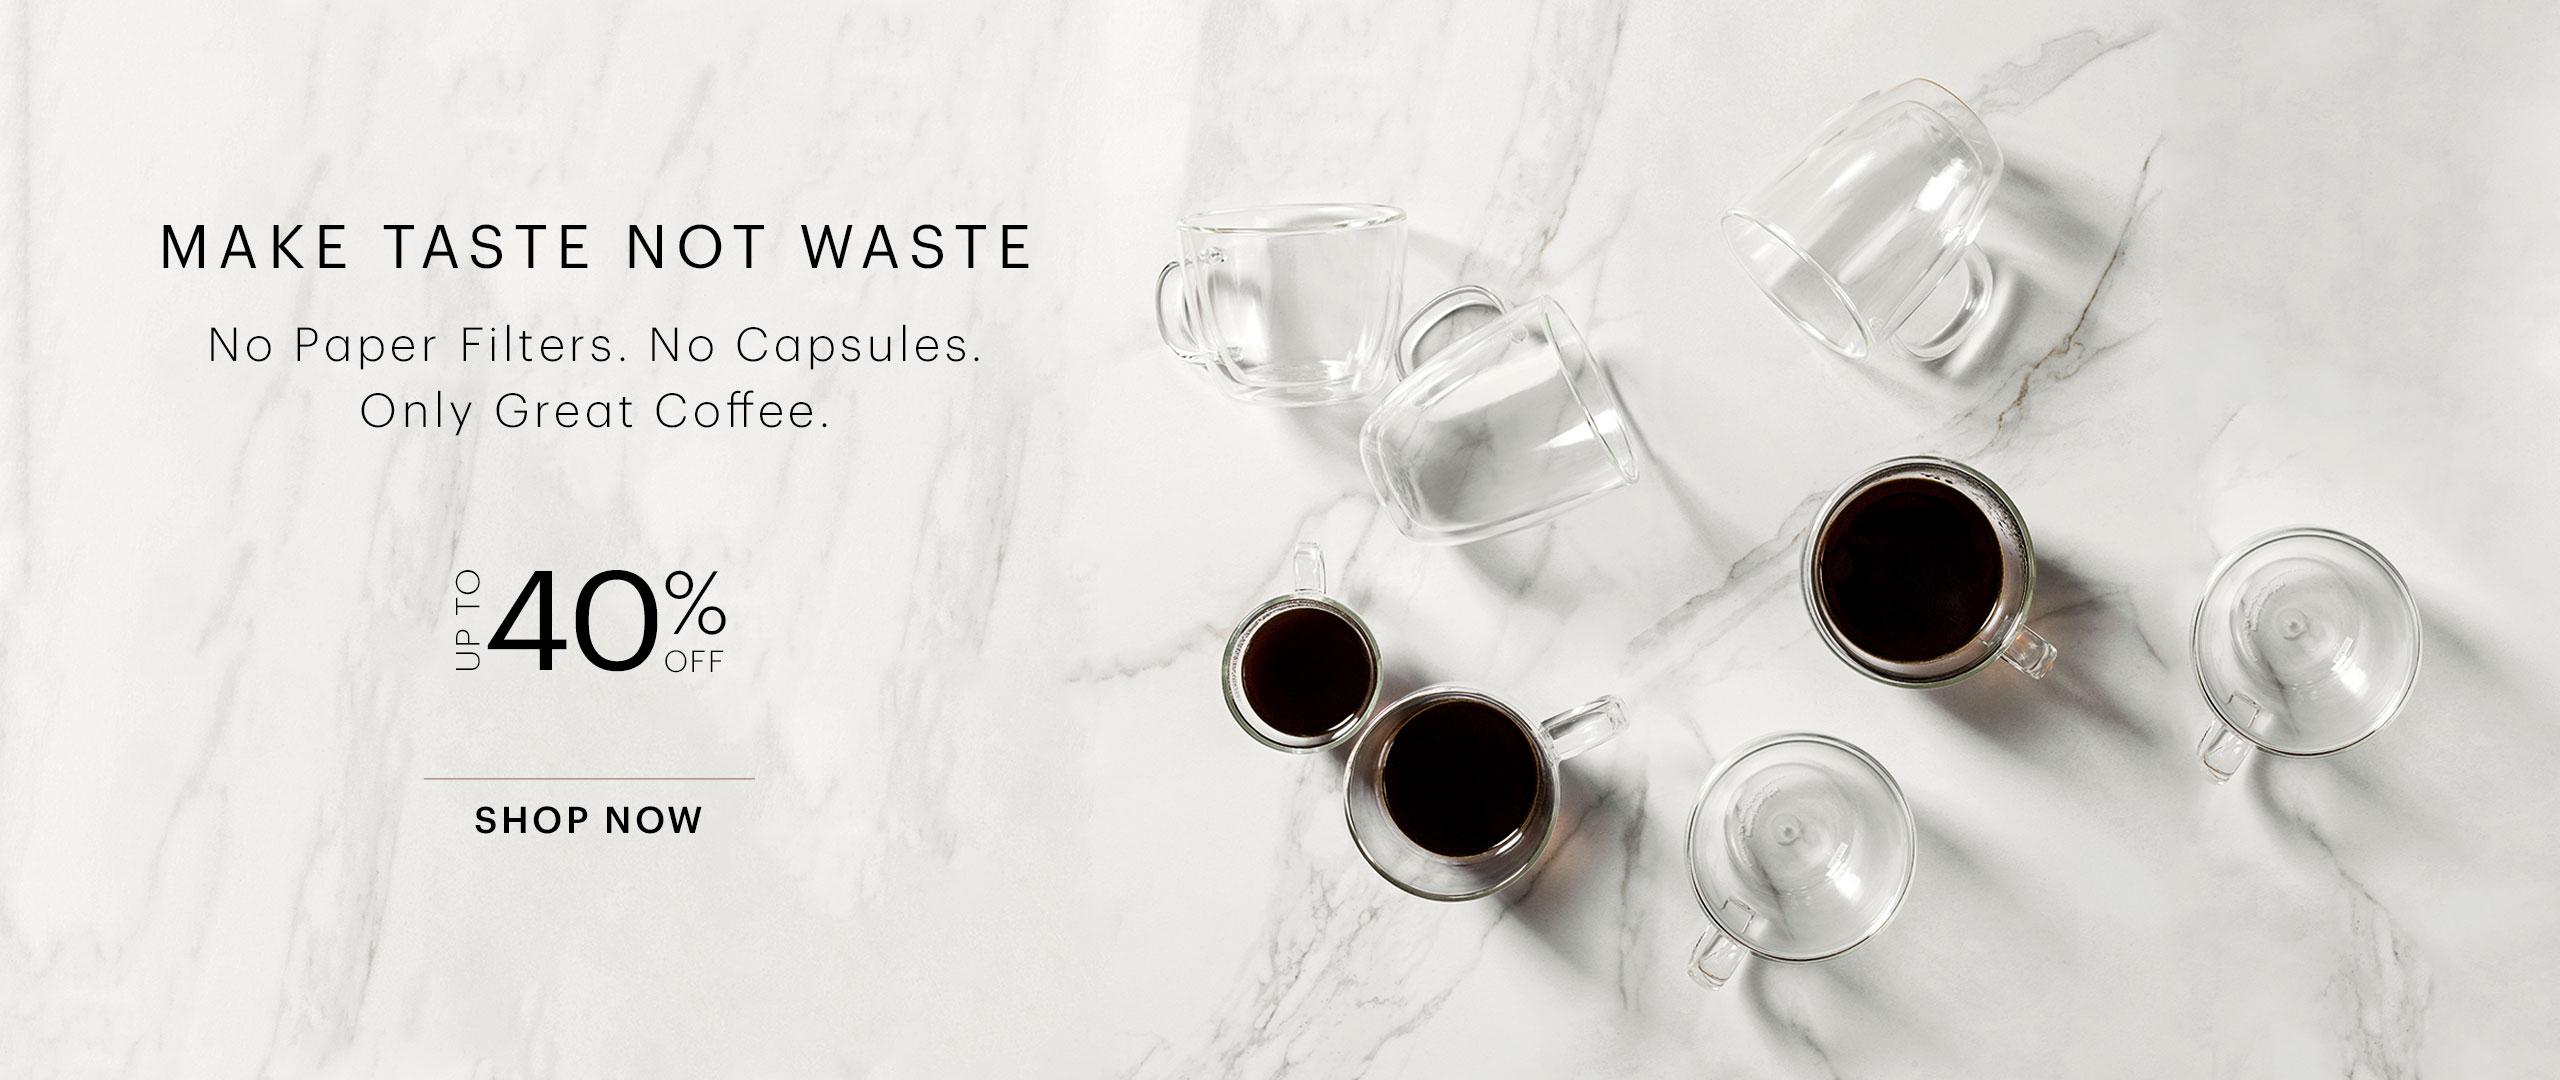 BEU [EN] - Make Taste Not Waste